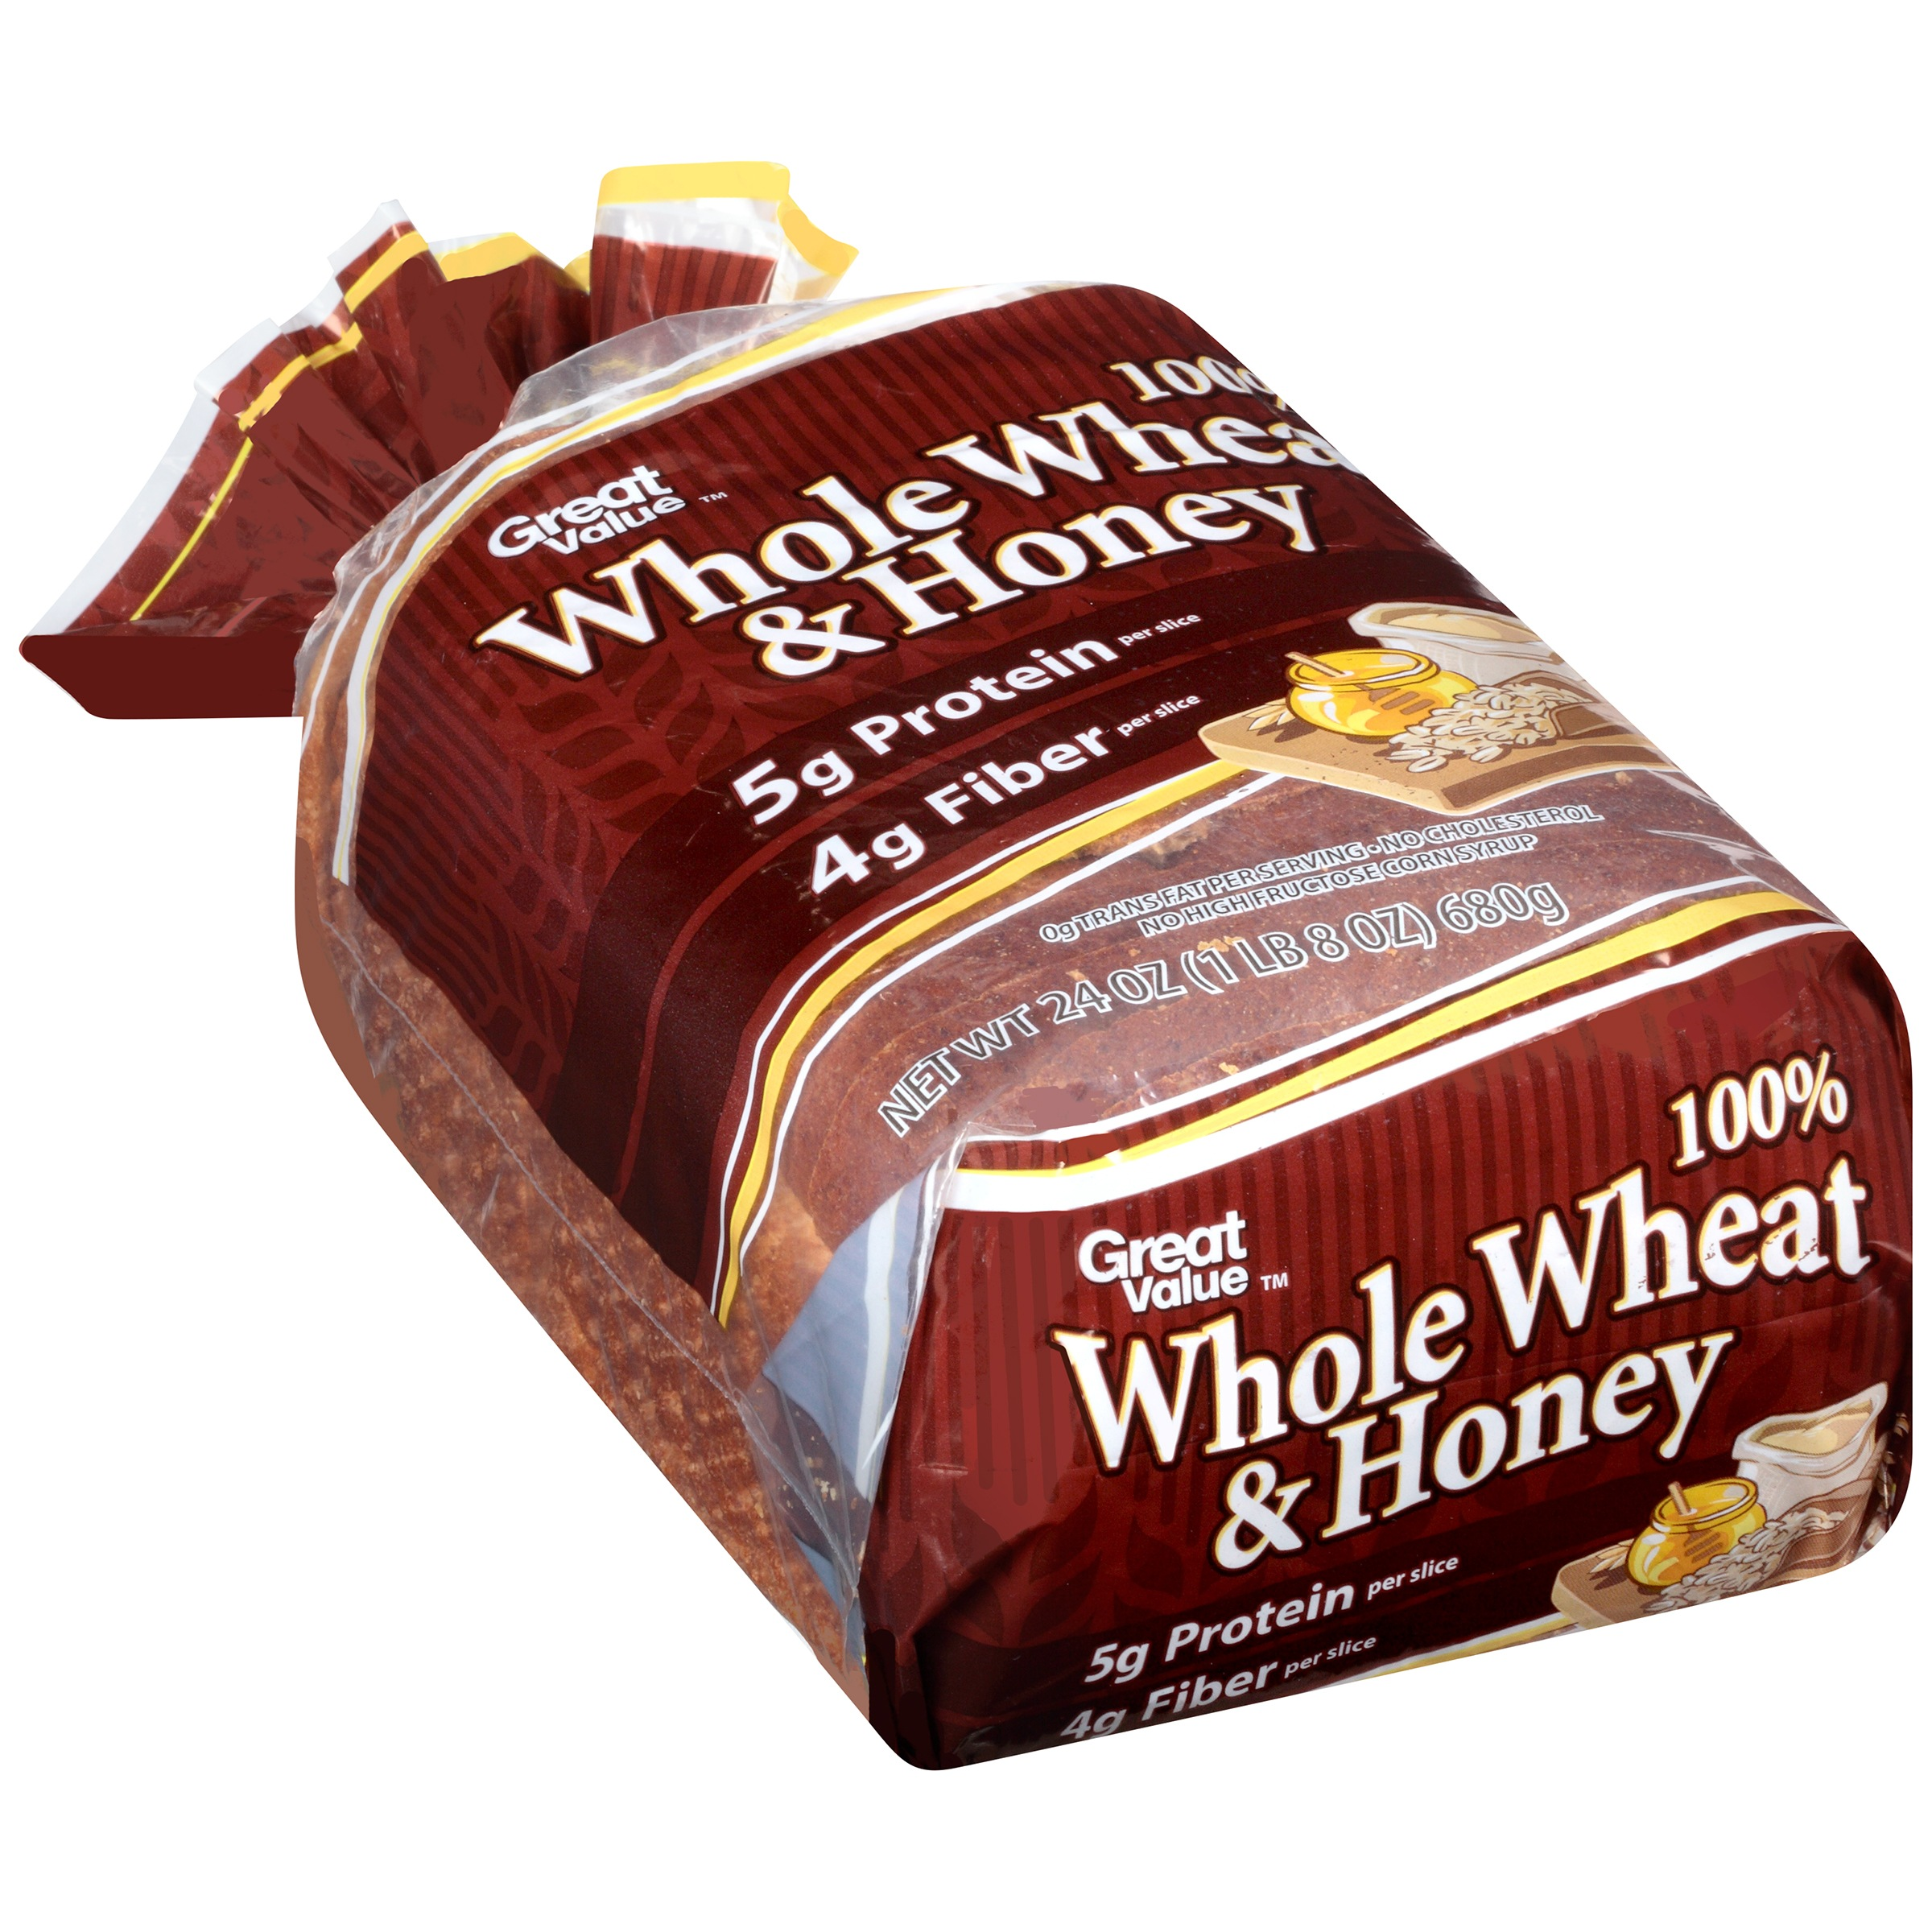 Great Value 100% Whole Wheat & Honey Bread, 24 oz